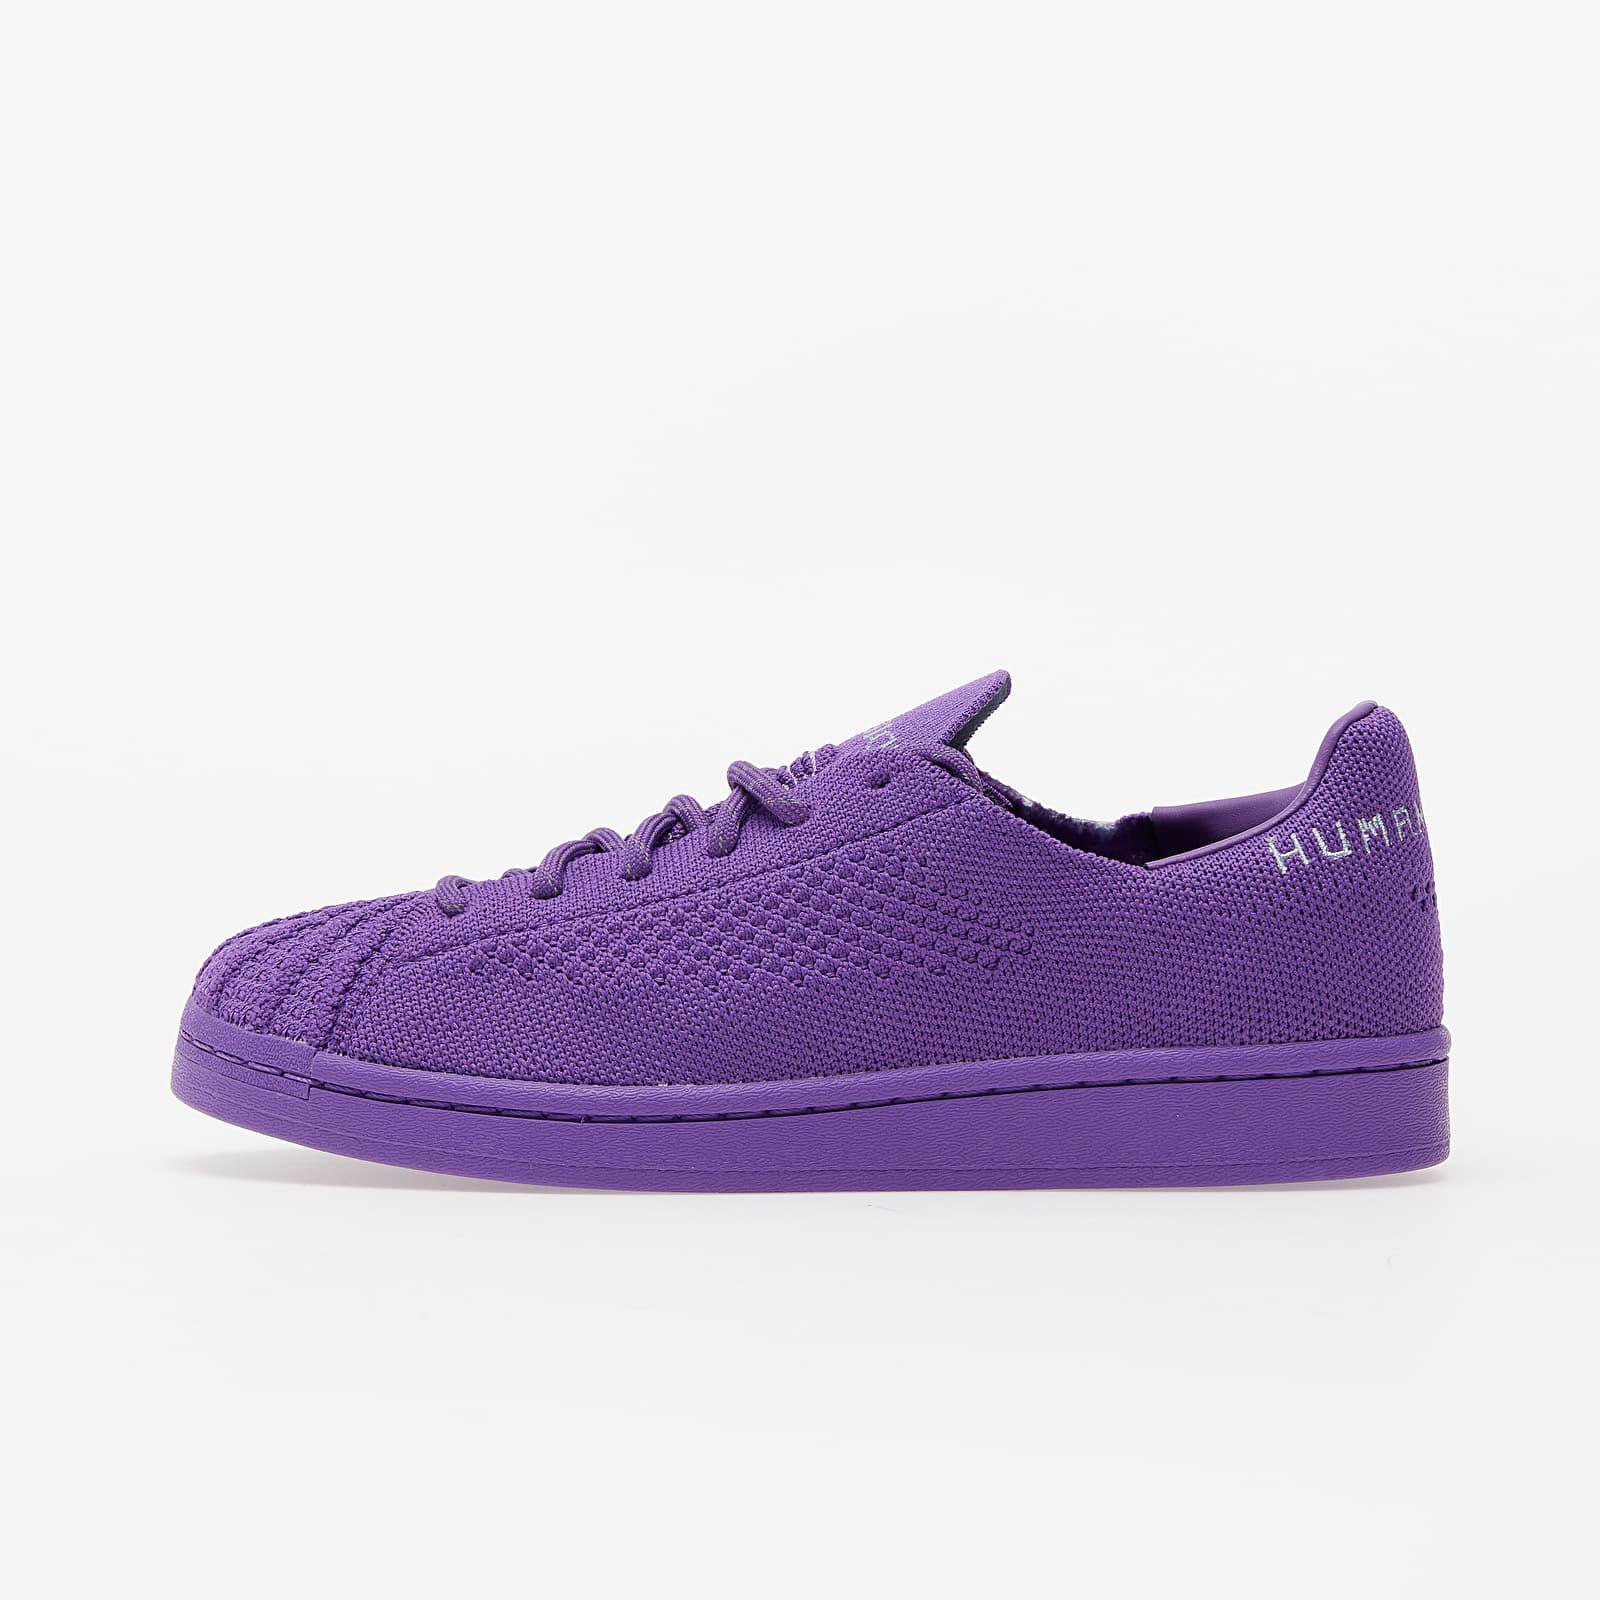 Încălțăminte și sneakerși pentru bărbați adidas x Pharrell Williams Superstar Pk Active Purple/ Grey Two/ Night Red